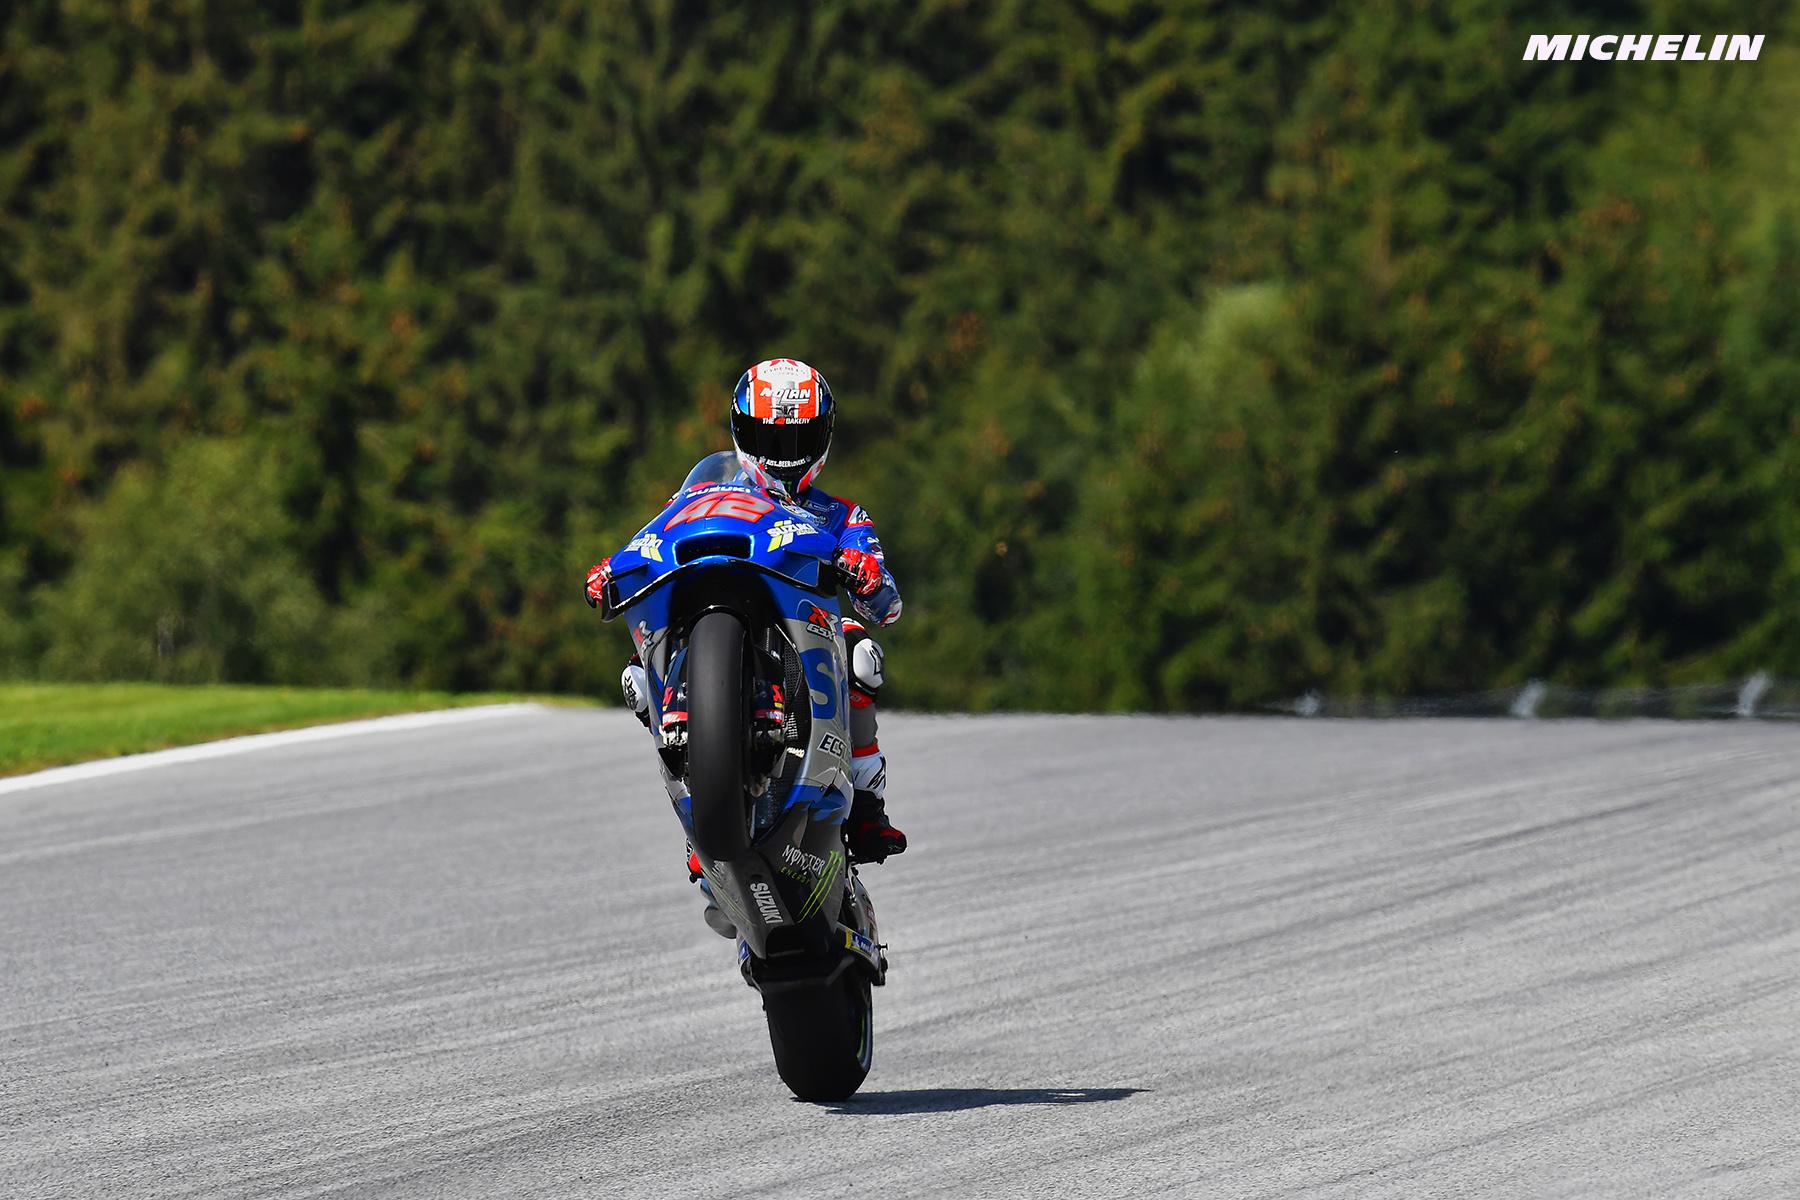 MotoGP2021 初日総合4位 アレックス・リンス「夏休み明けの走行は難しかった」